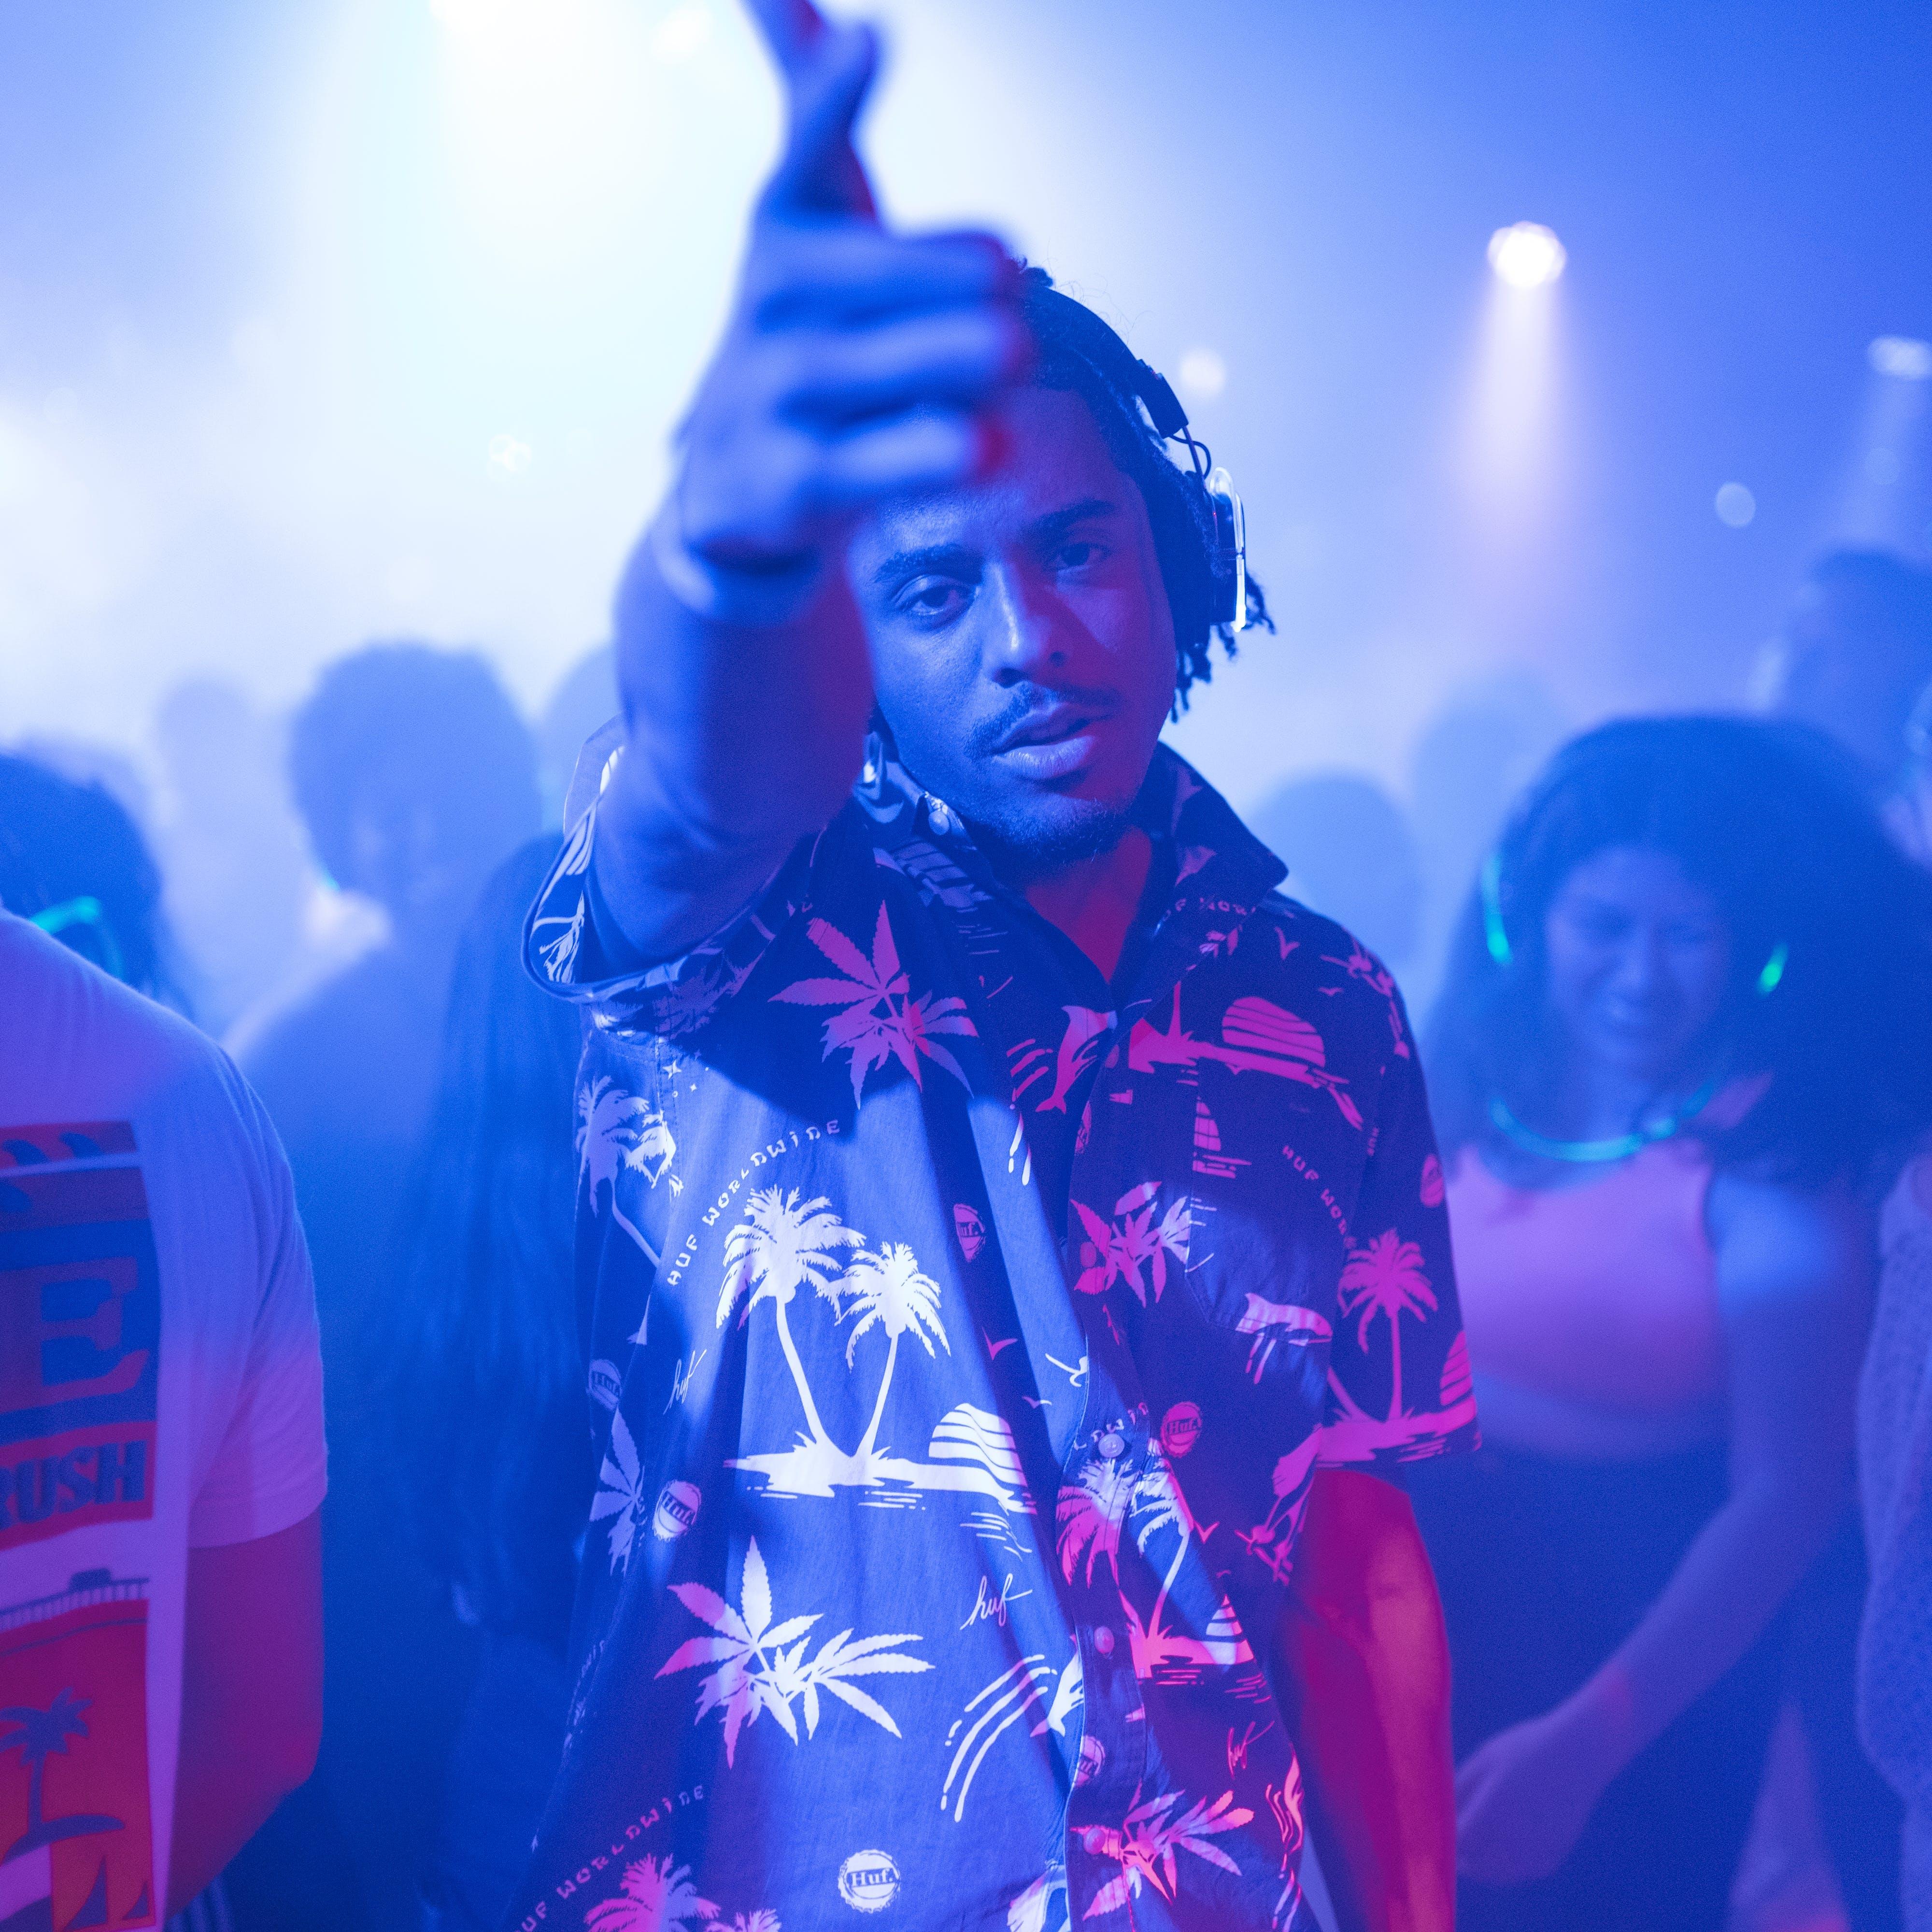 Kostenloses Stock Foto zu afroamerikaner, aufführung, band, beleuchtung